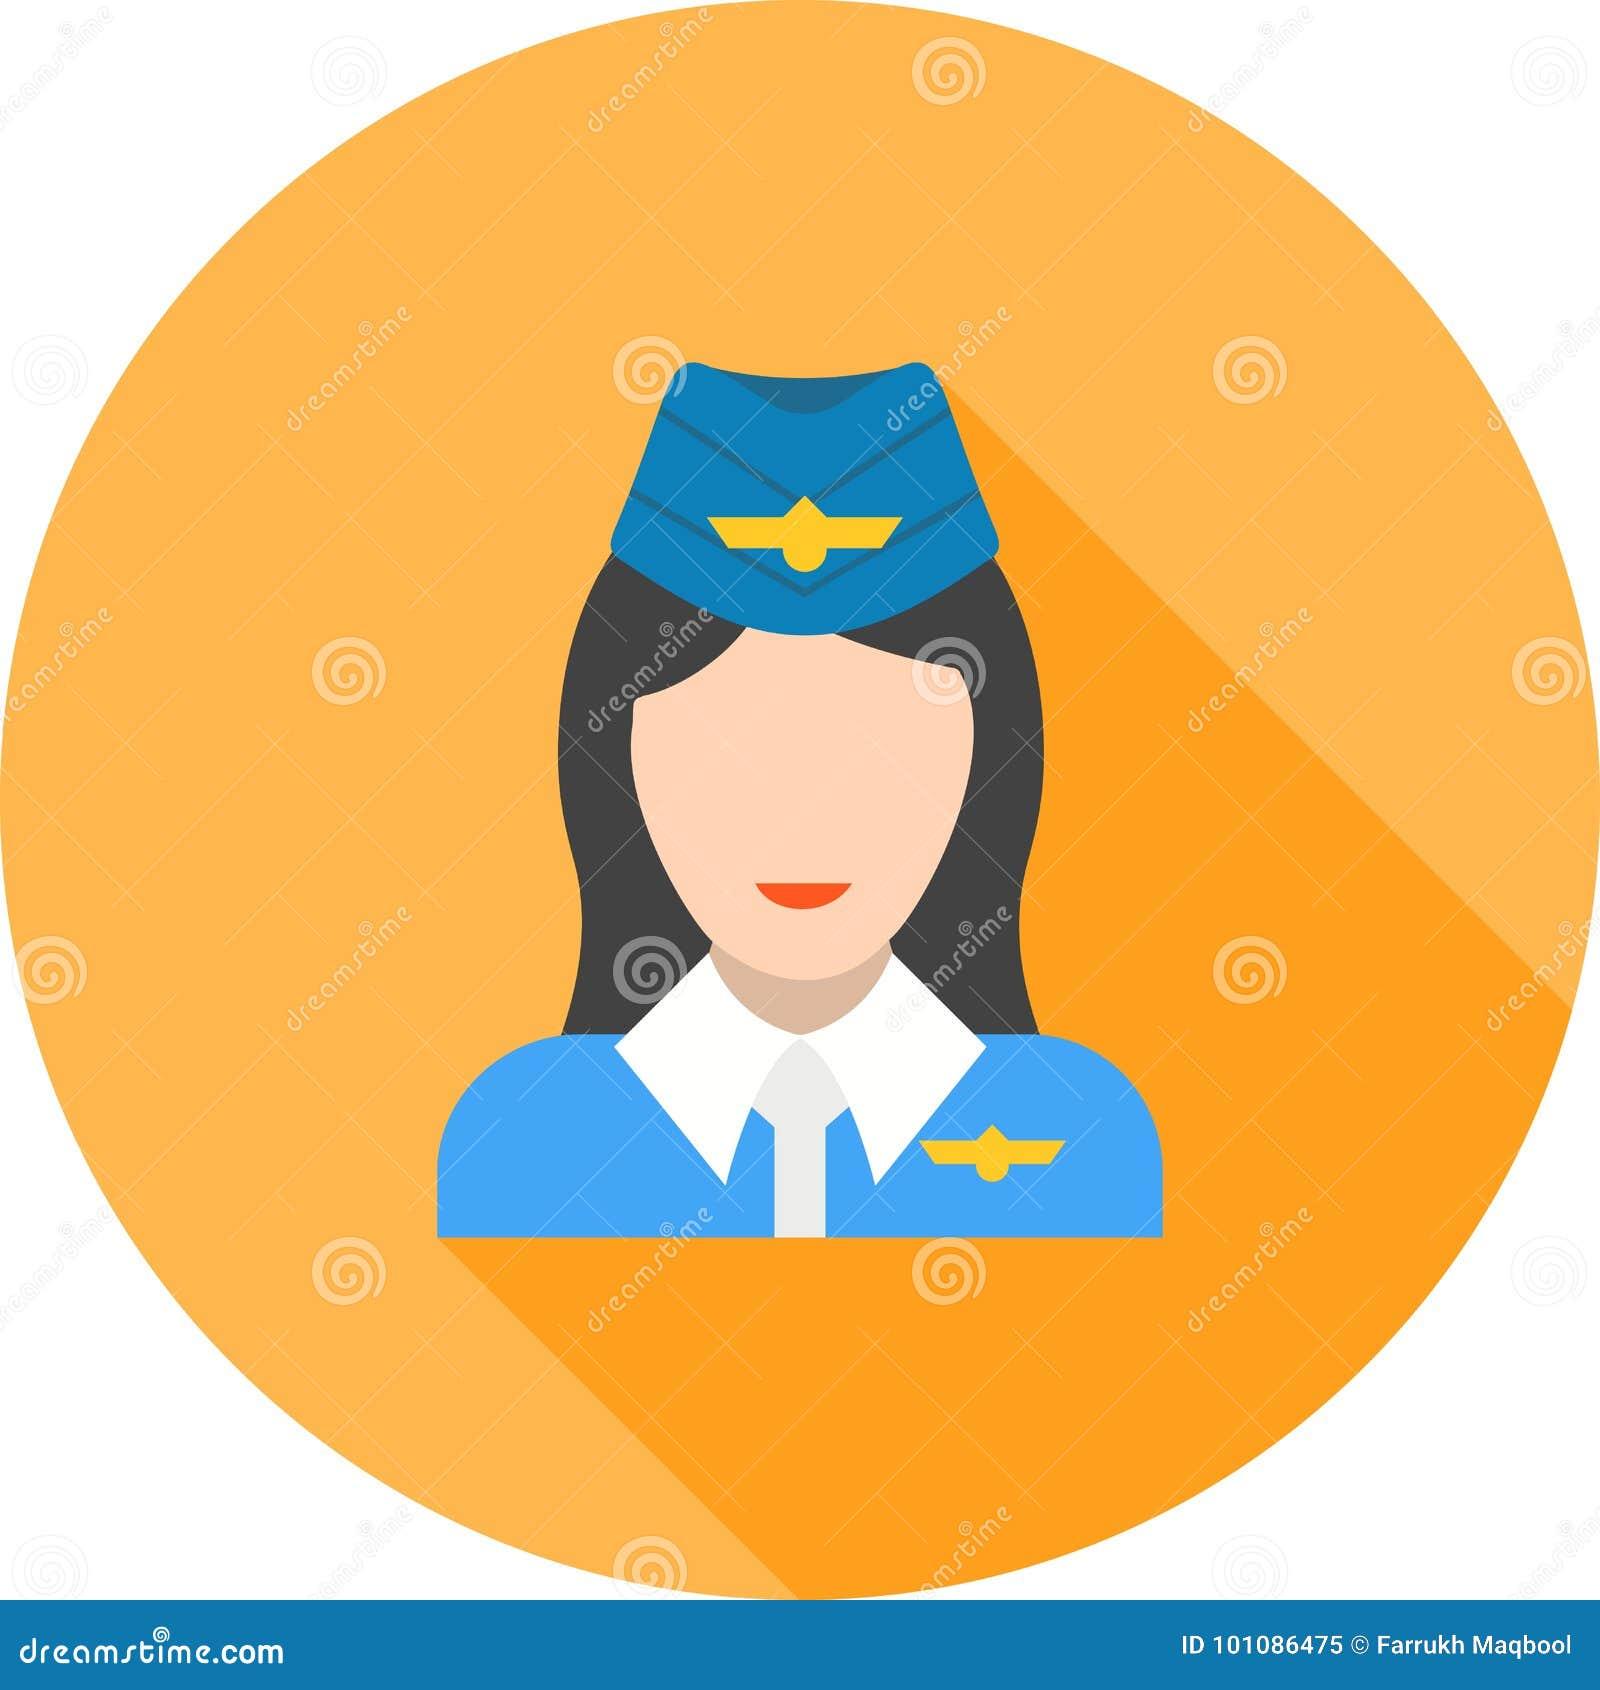 from Lennon flight crew dating app